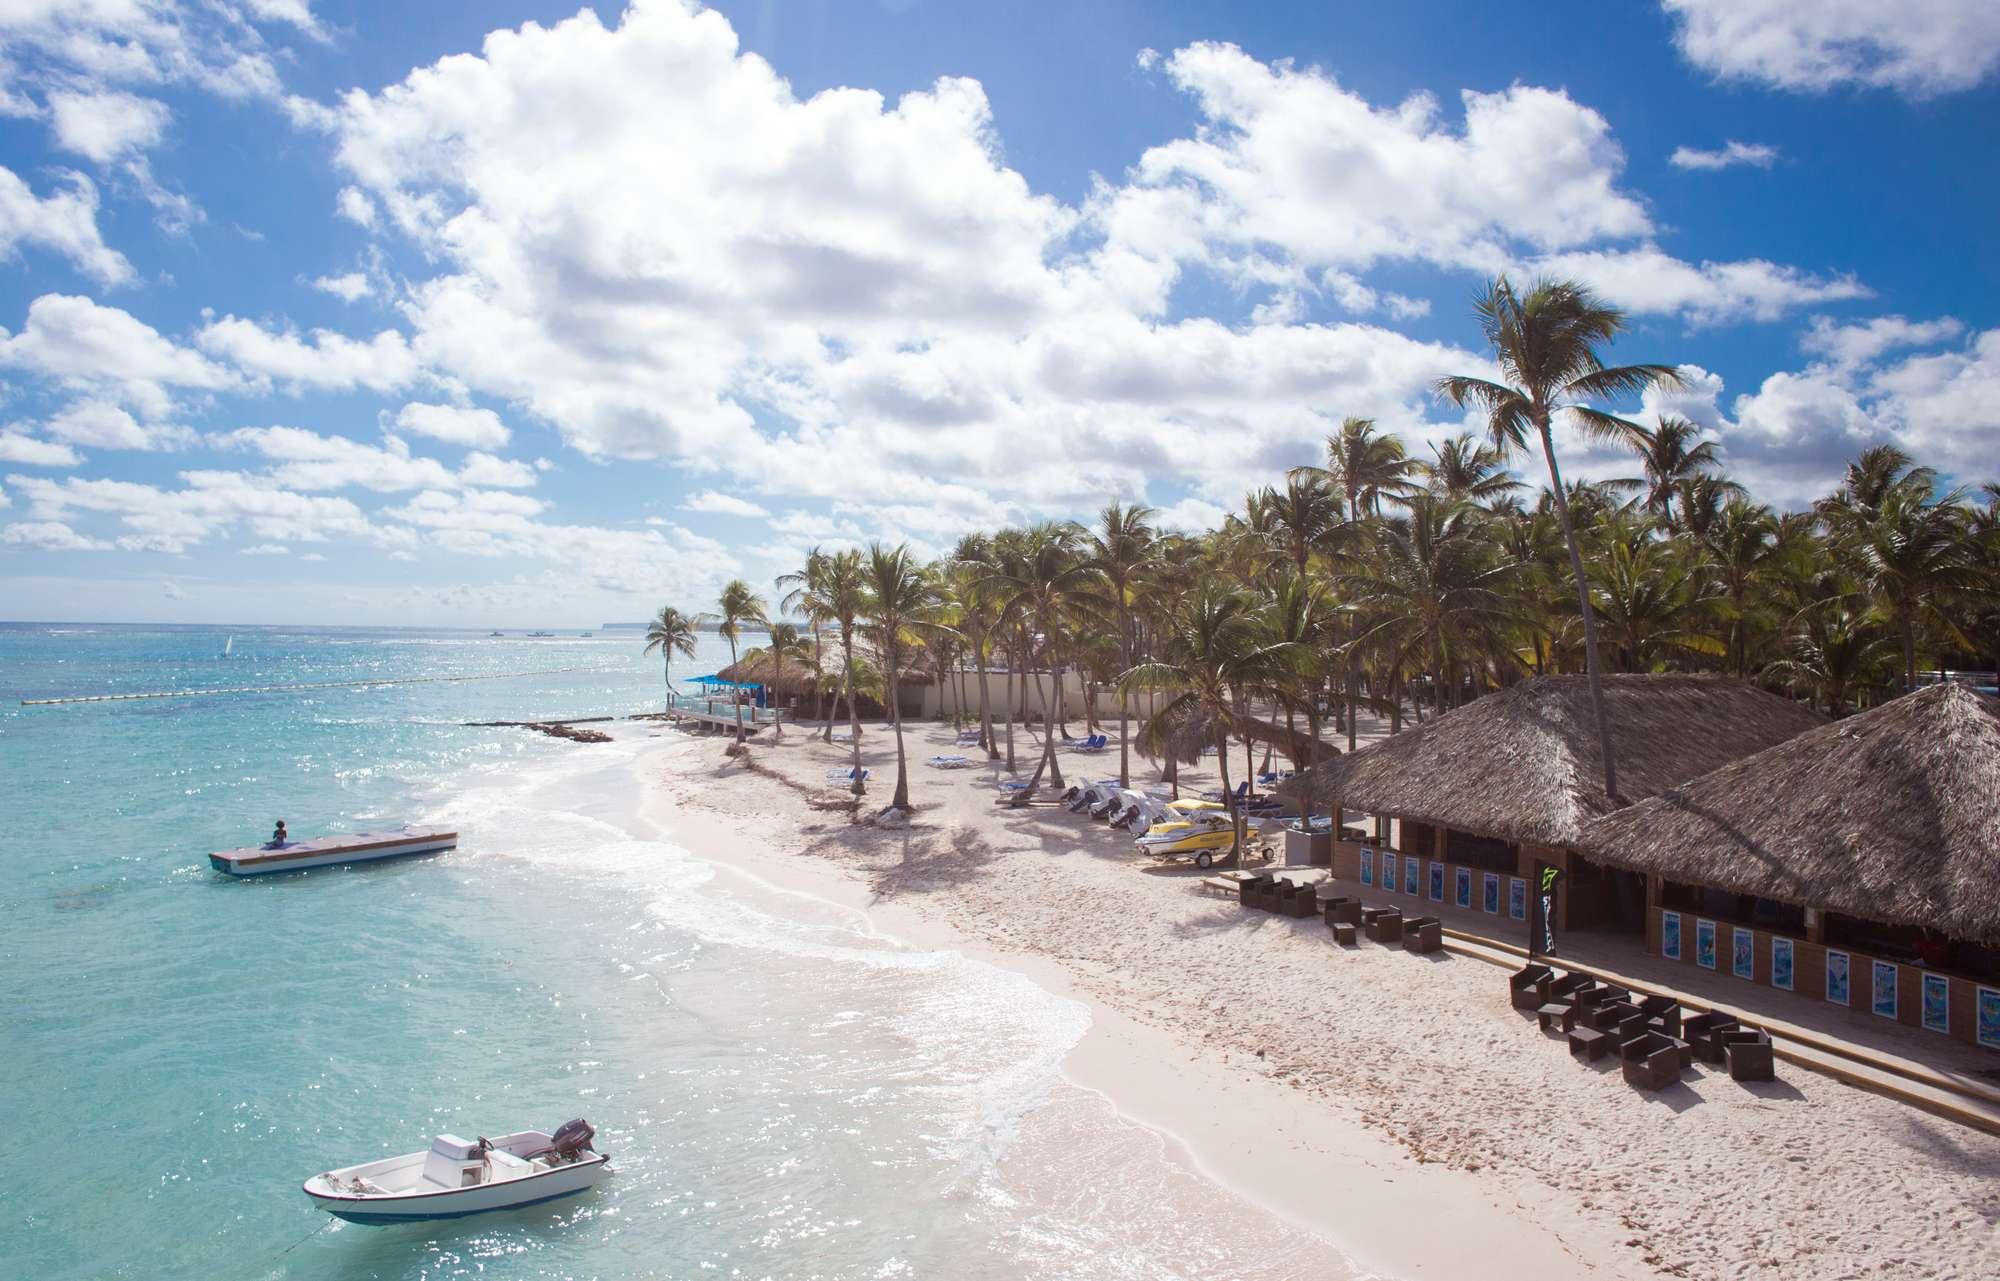 club med punta cana, Dominican Republic